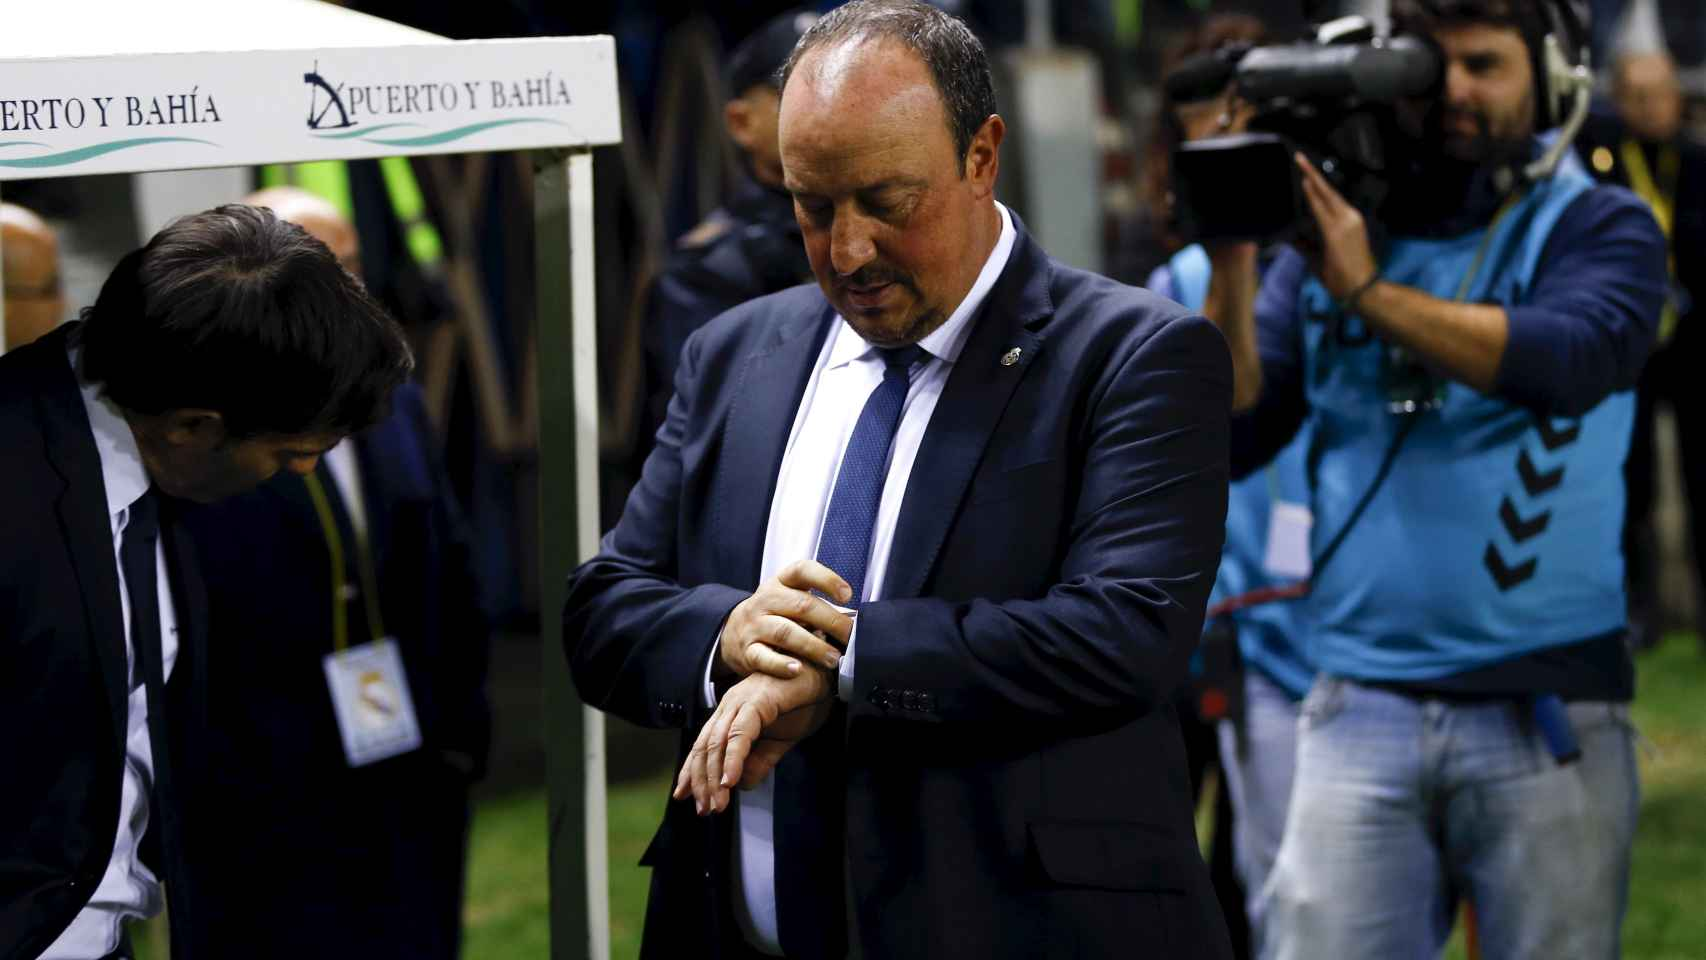 Rafa Benítez mira el reloj durante el partido contra el Cádiz.